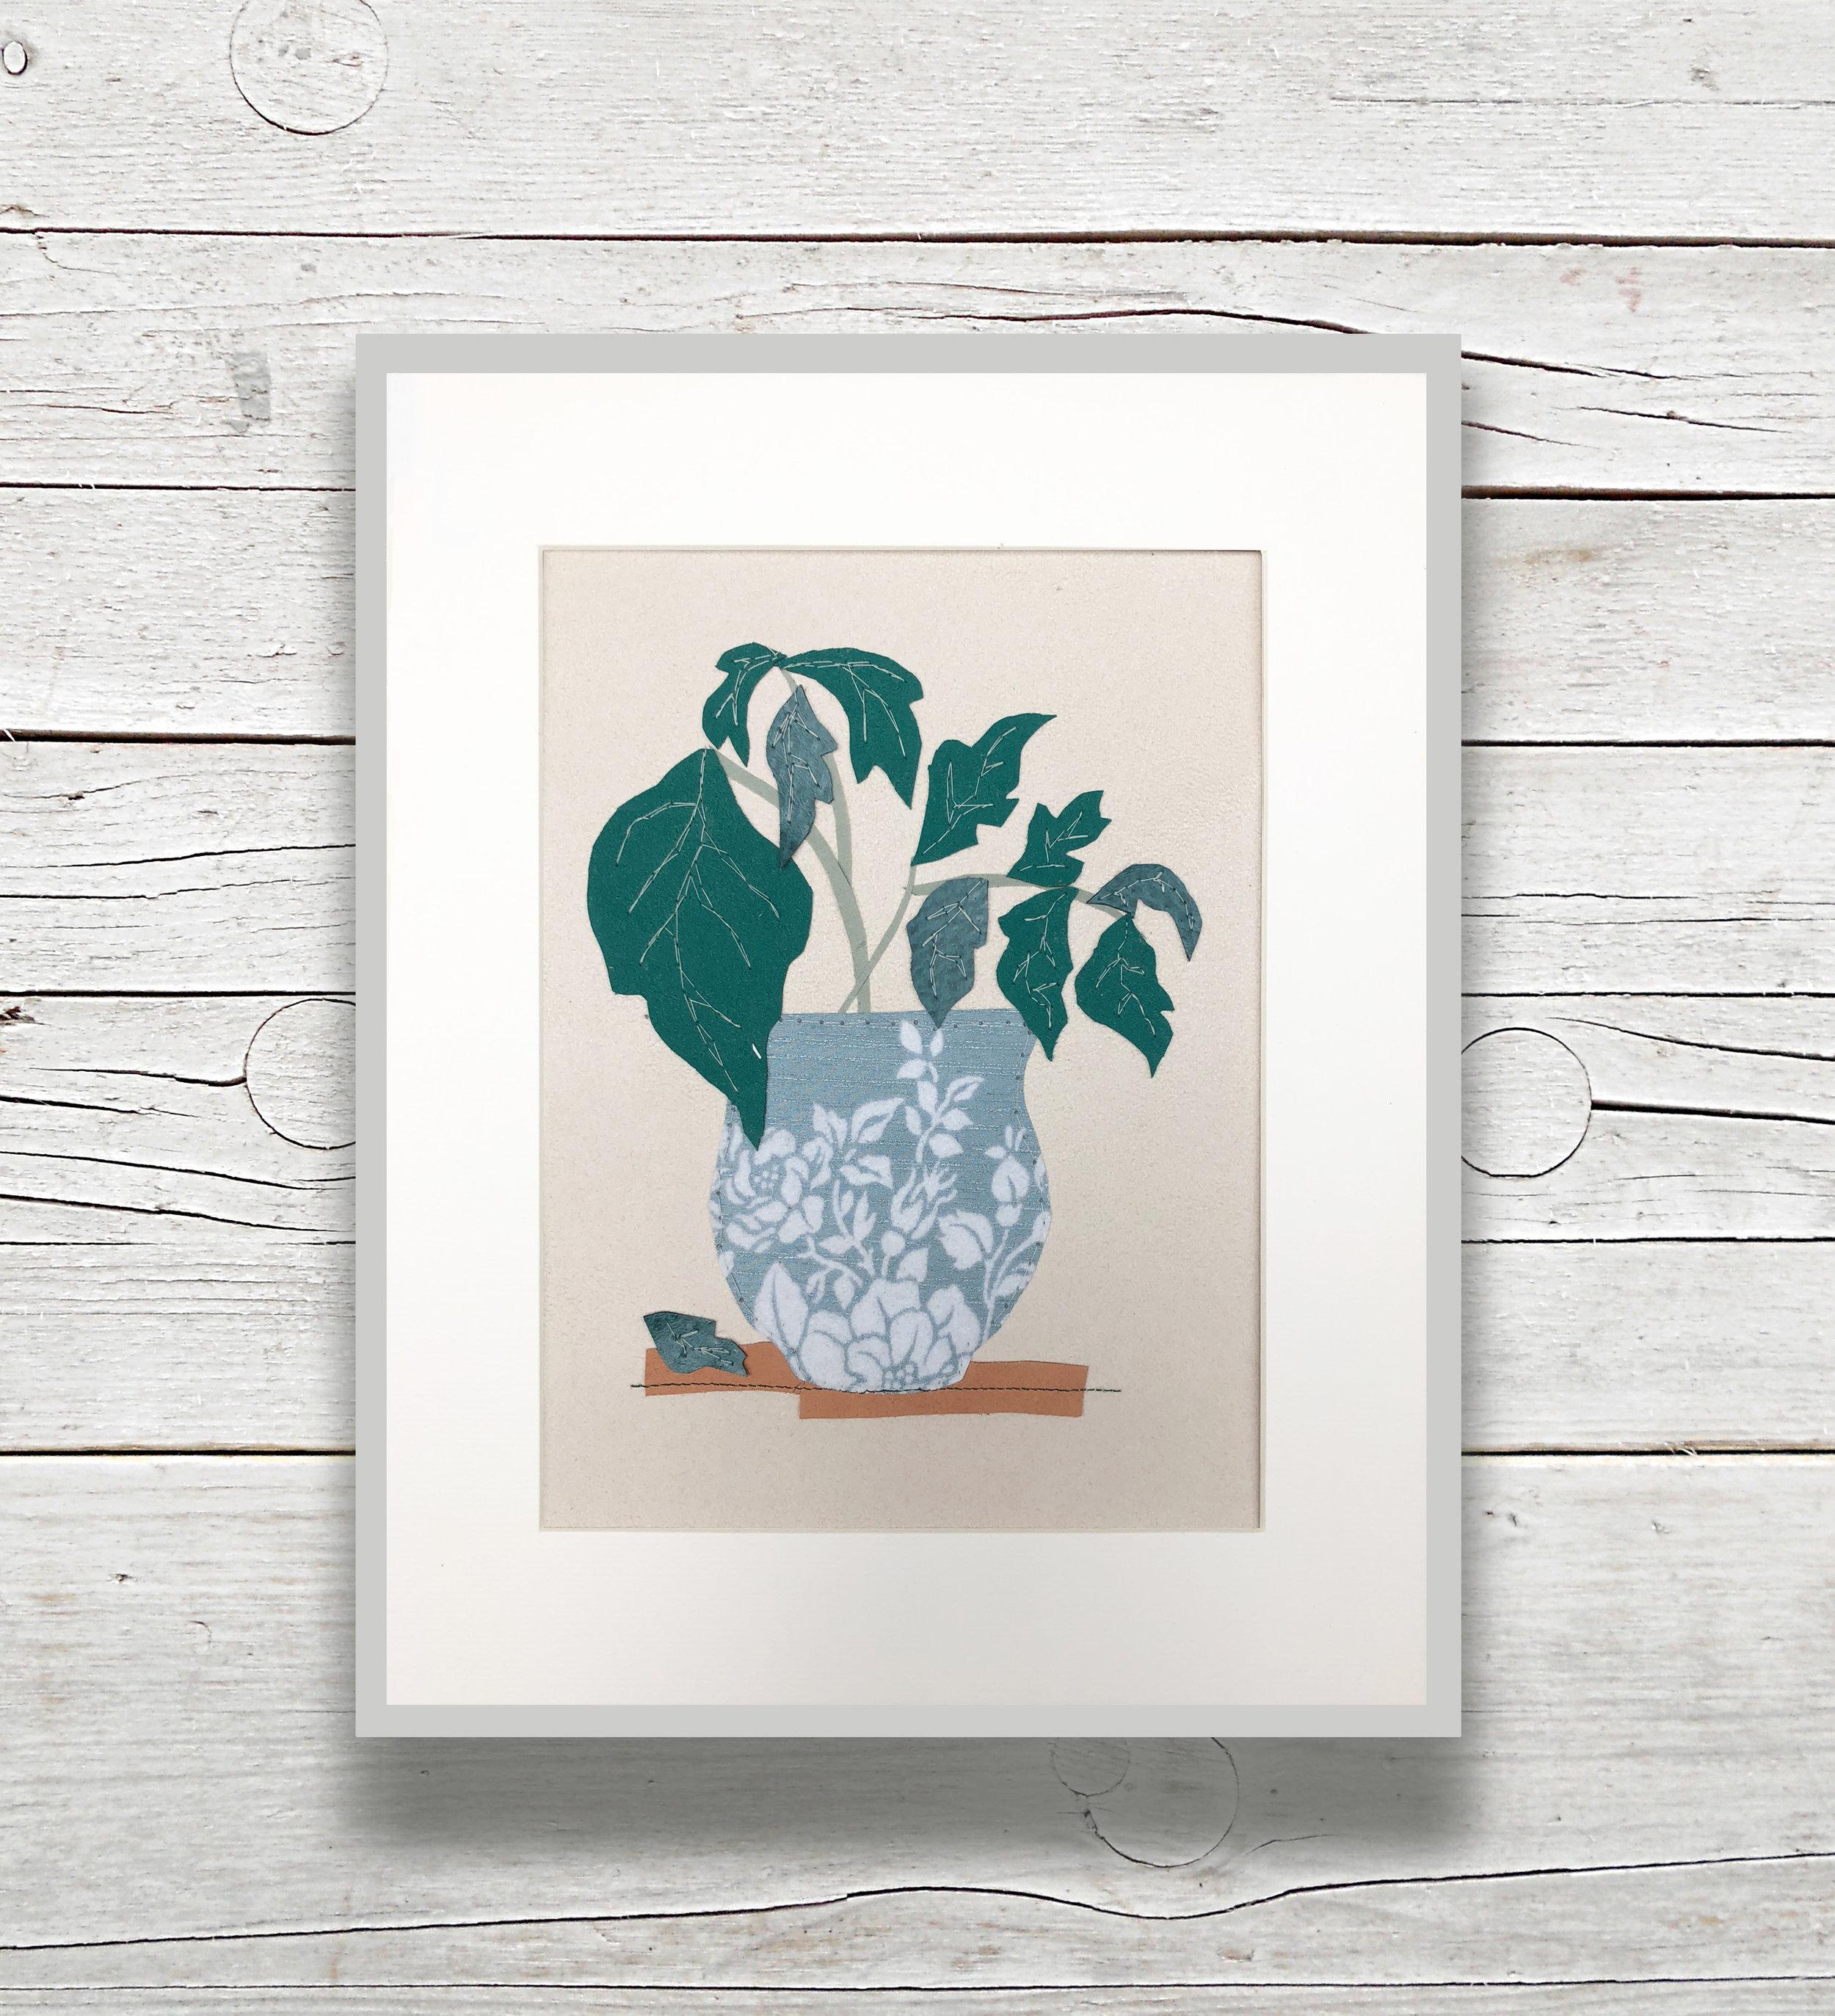 Grandma Plant 2.jpg